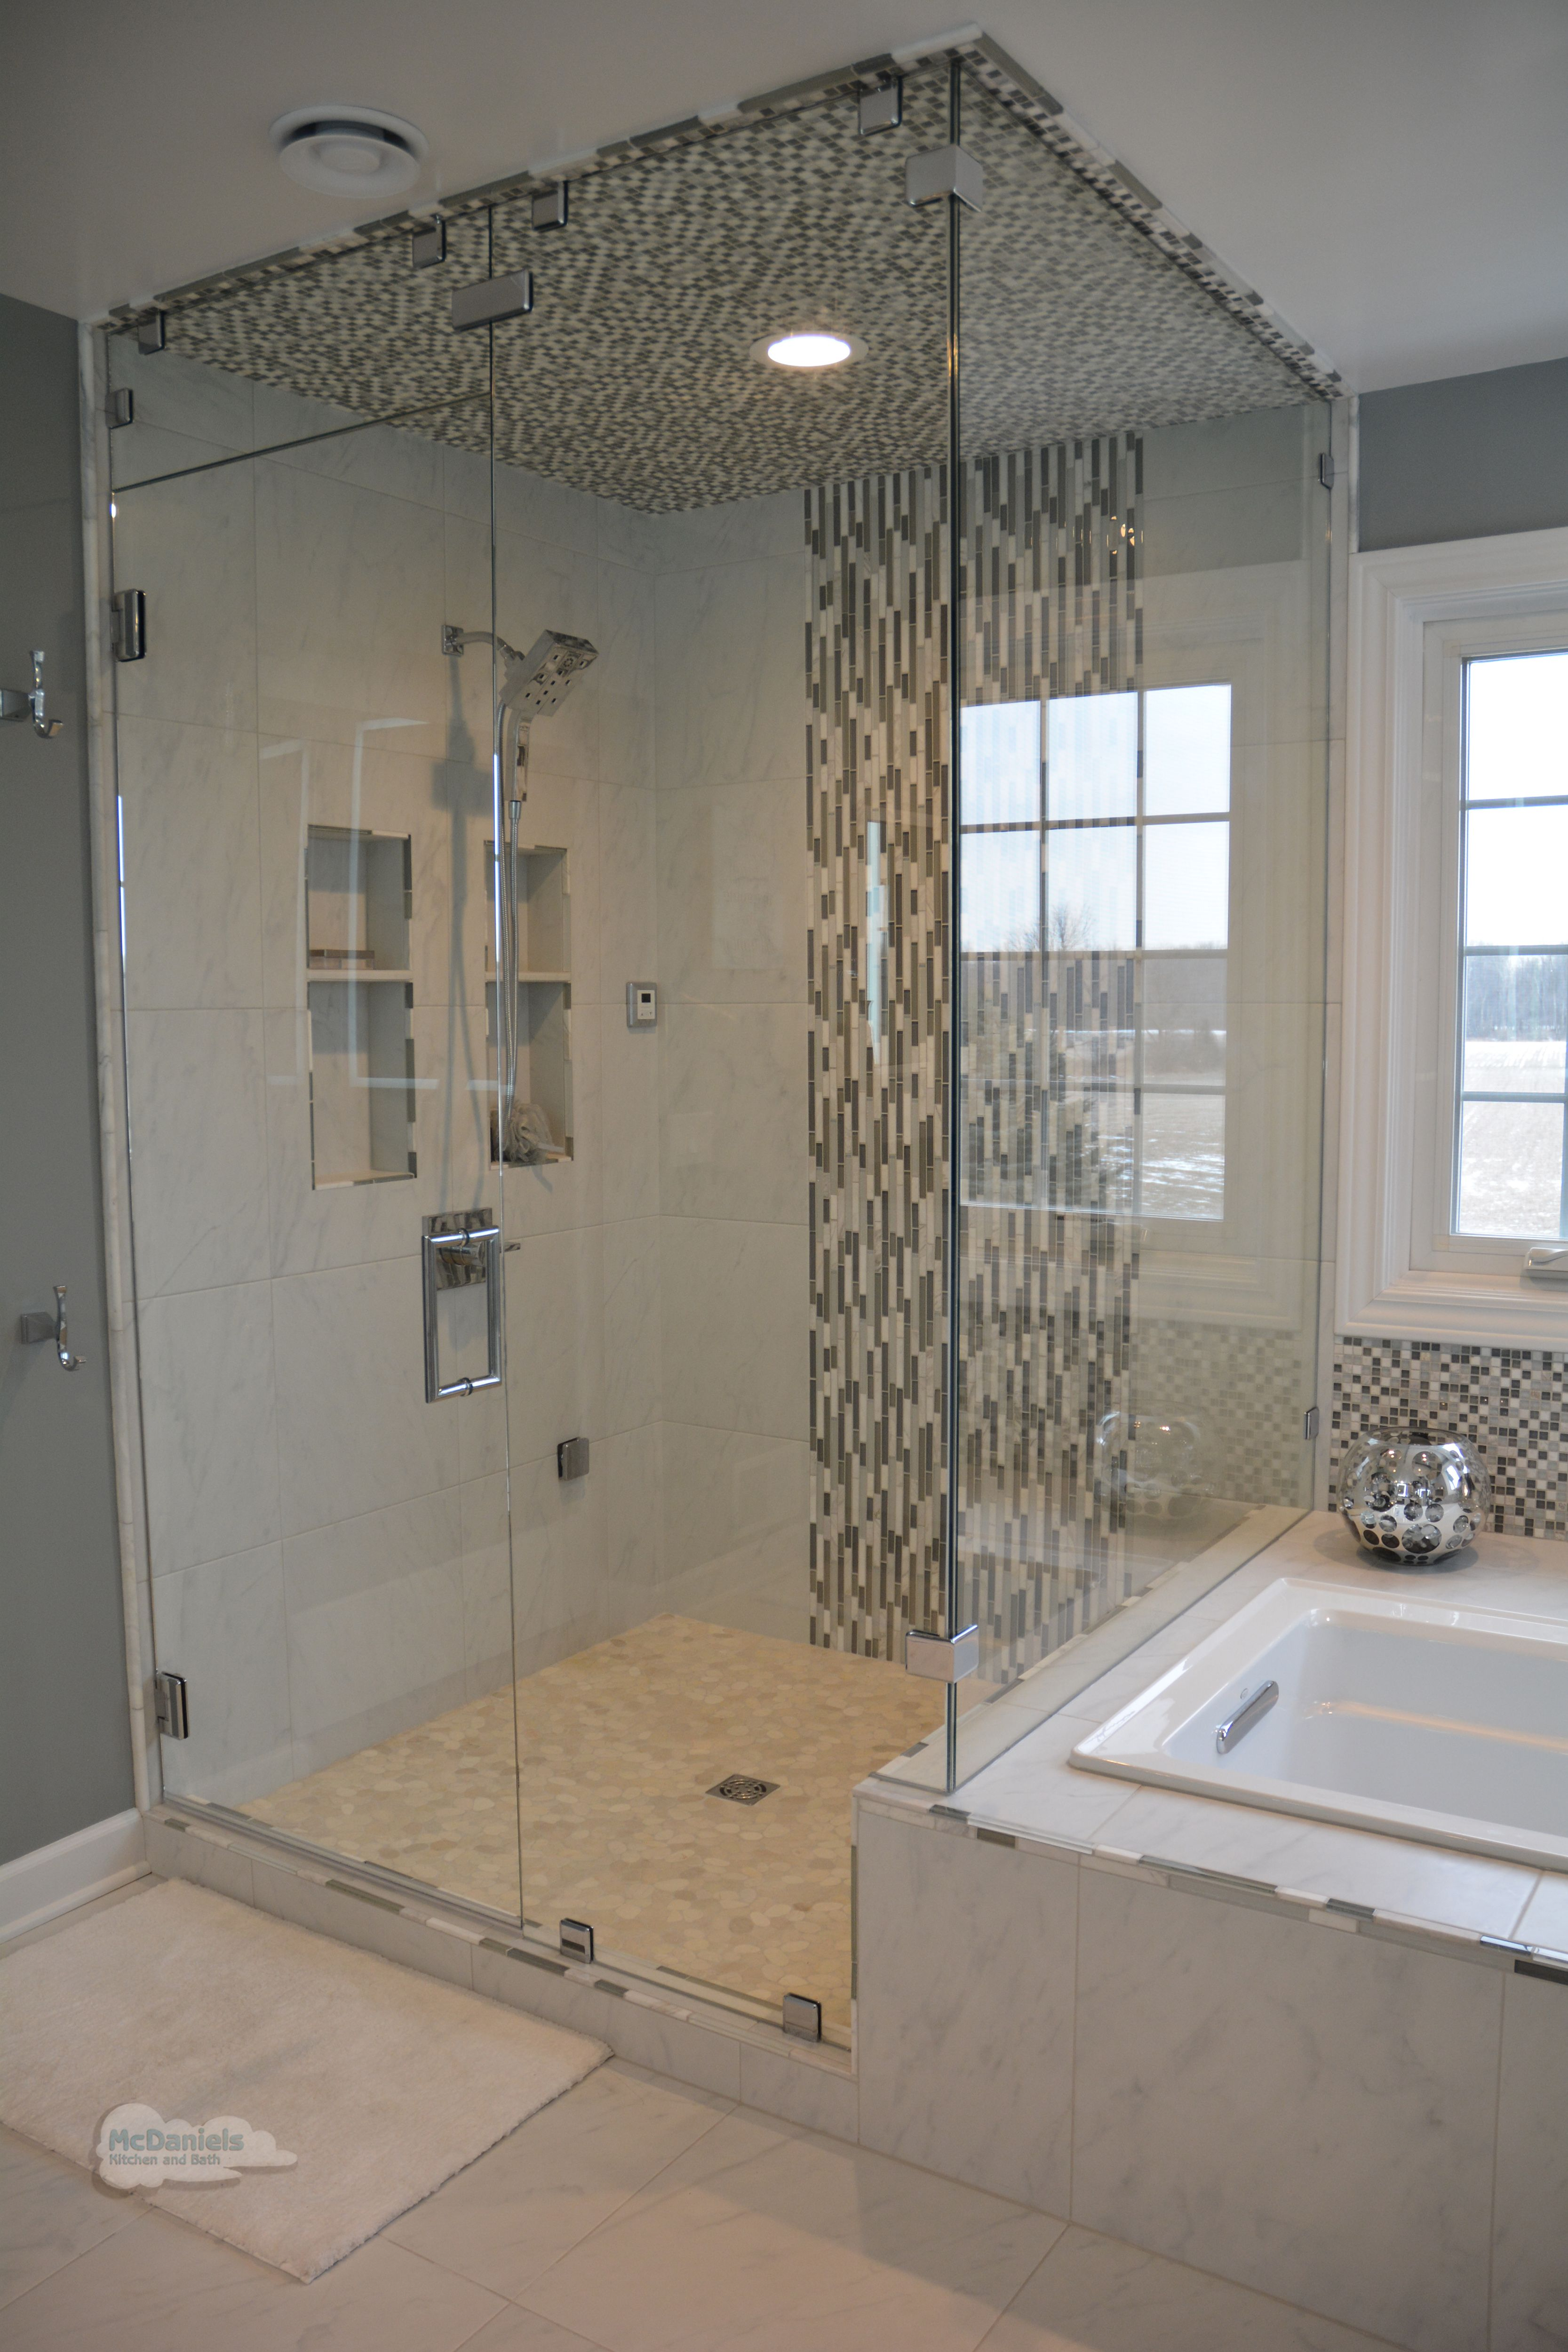 Local Kitchen Bathroom Design Remodeling Services Lansing Pa Bathroom Design Contemporary Bathroom Designs